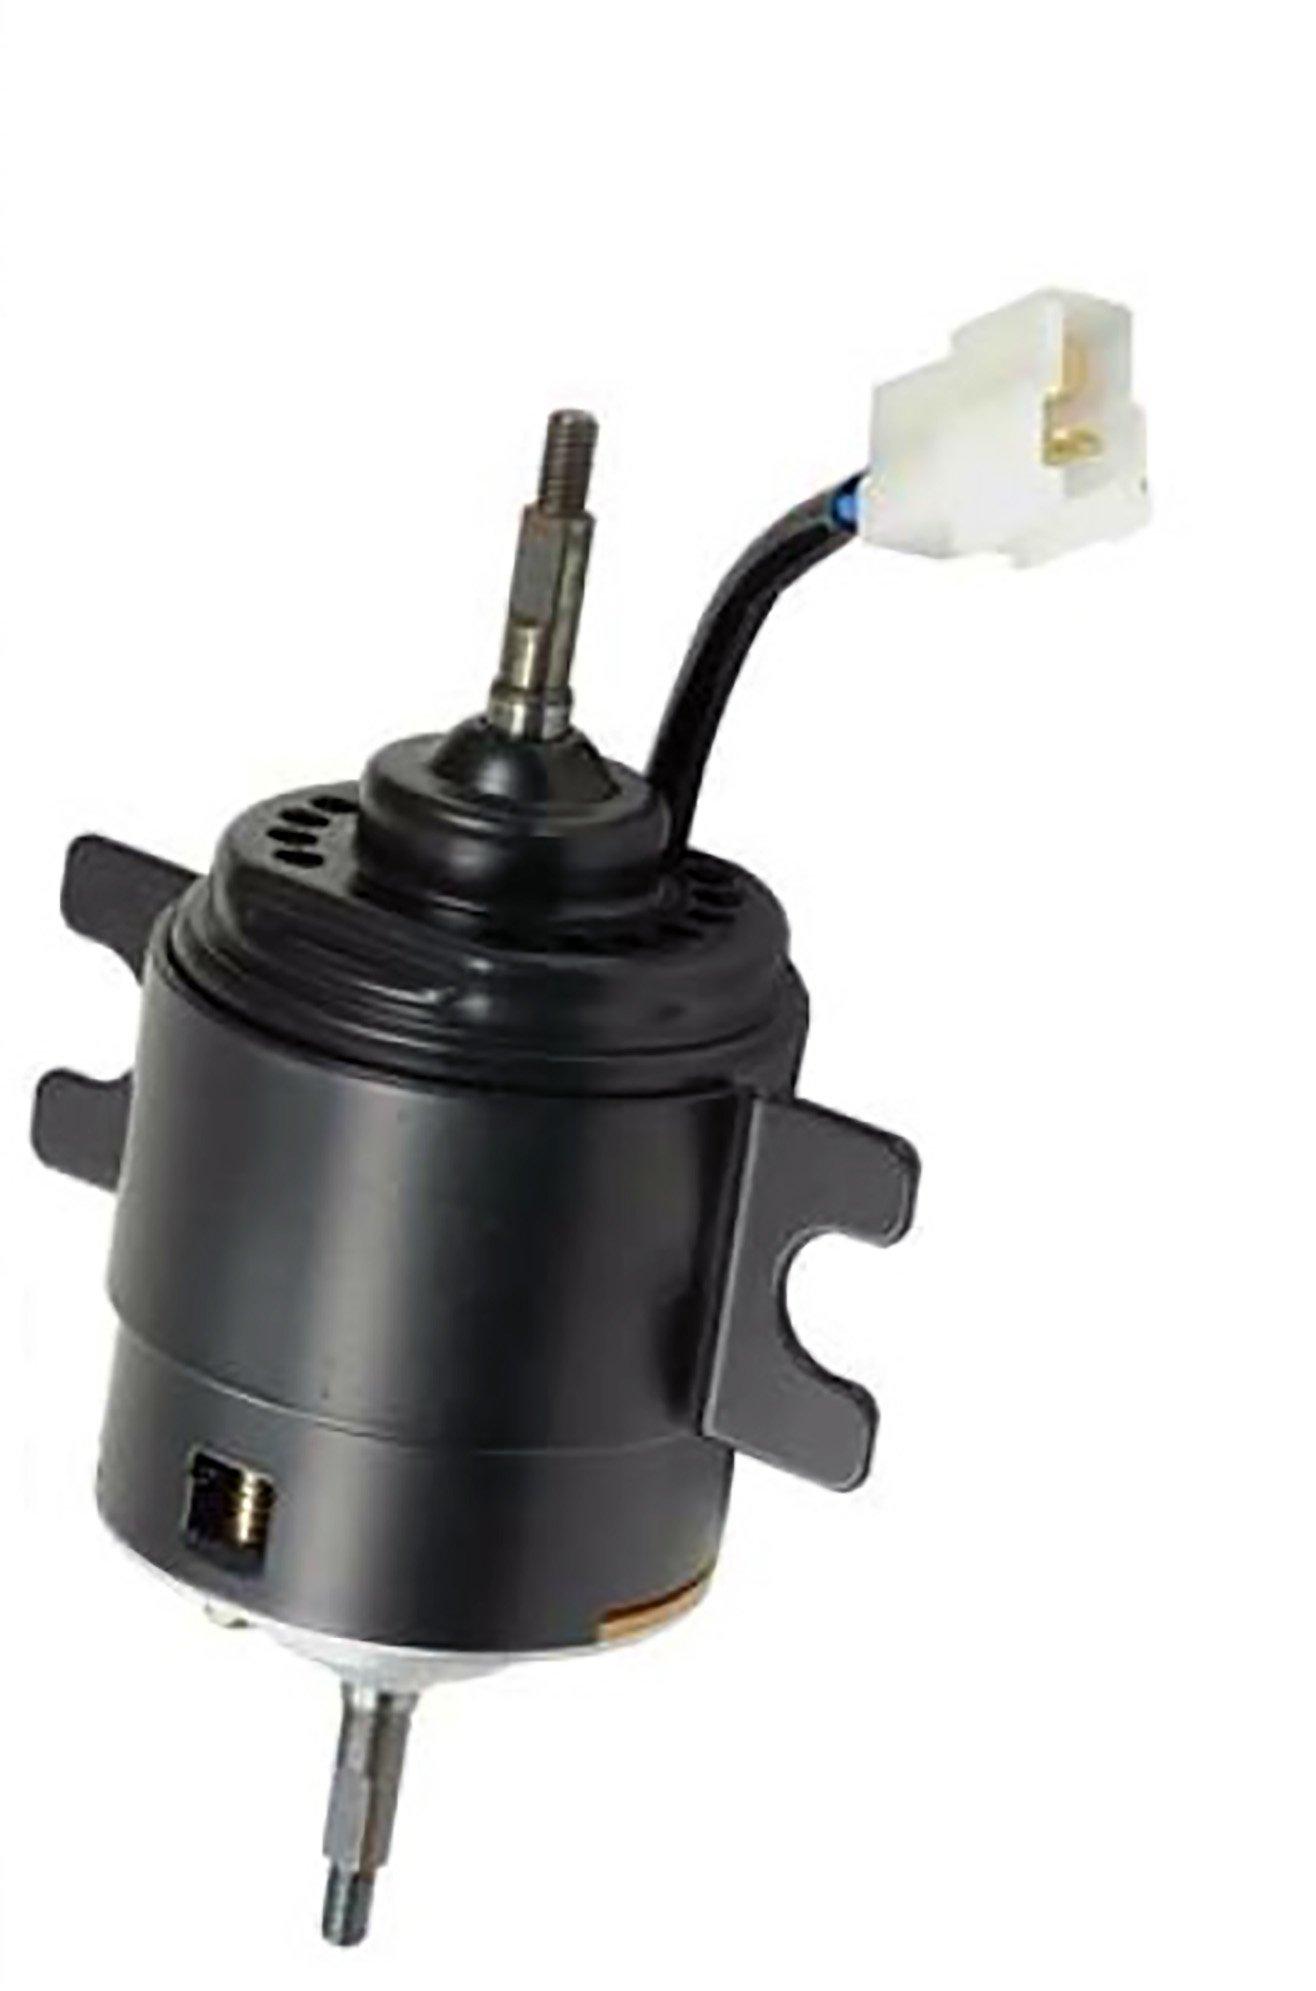 New OEM Denso Blower Motor for Komatsu 062500-3740, 062500-374, ND062500-3740, 24 Volt